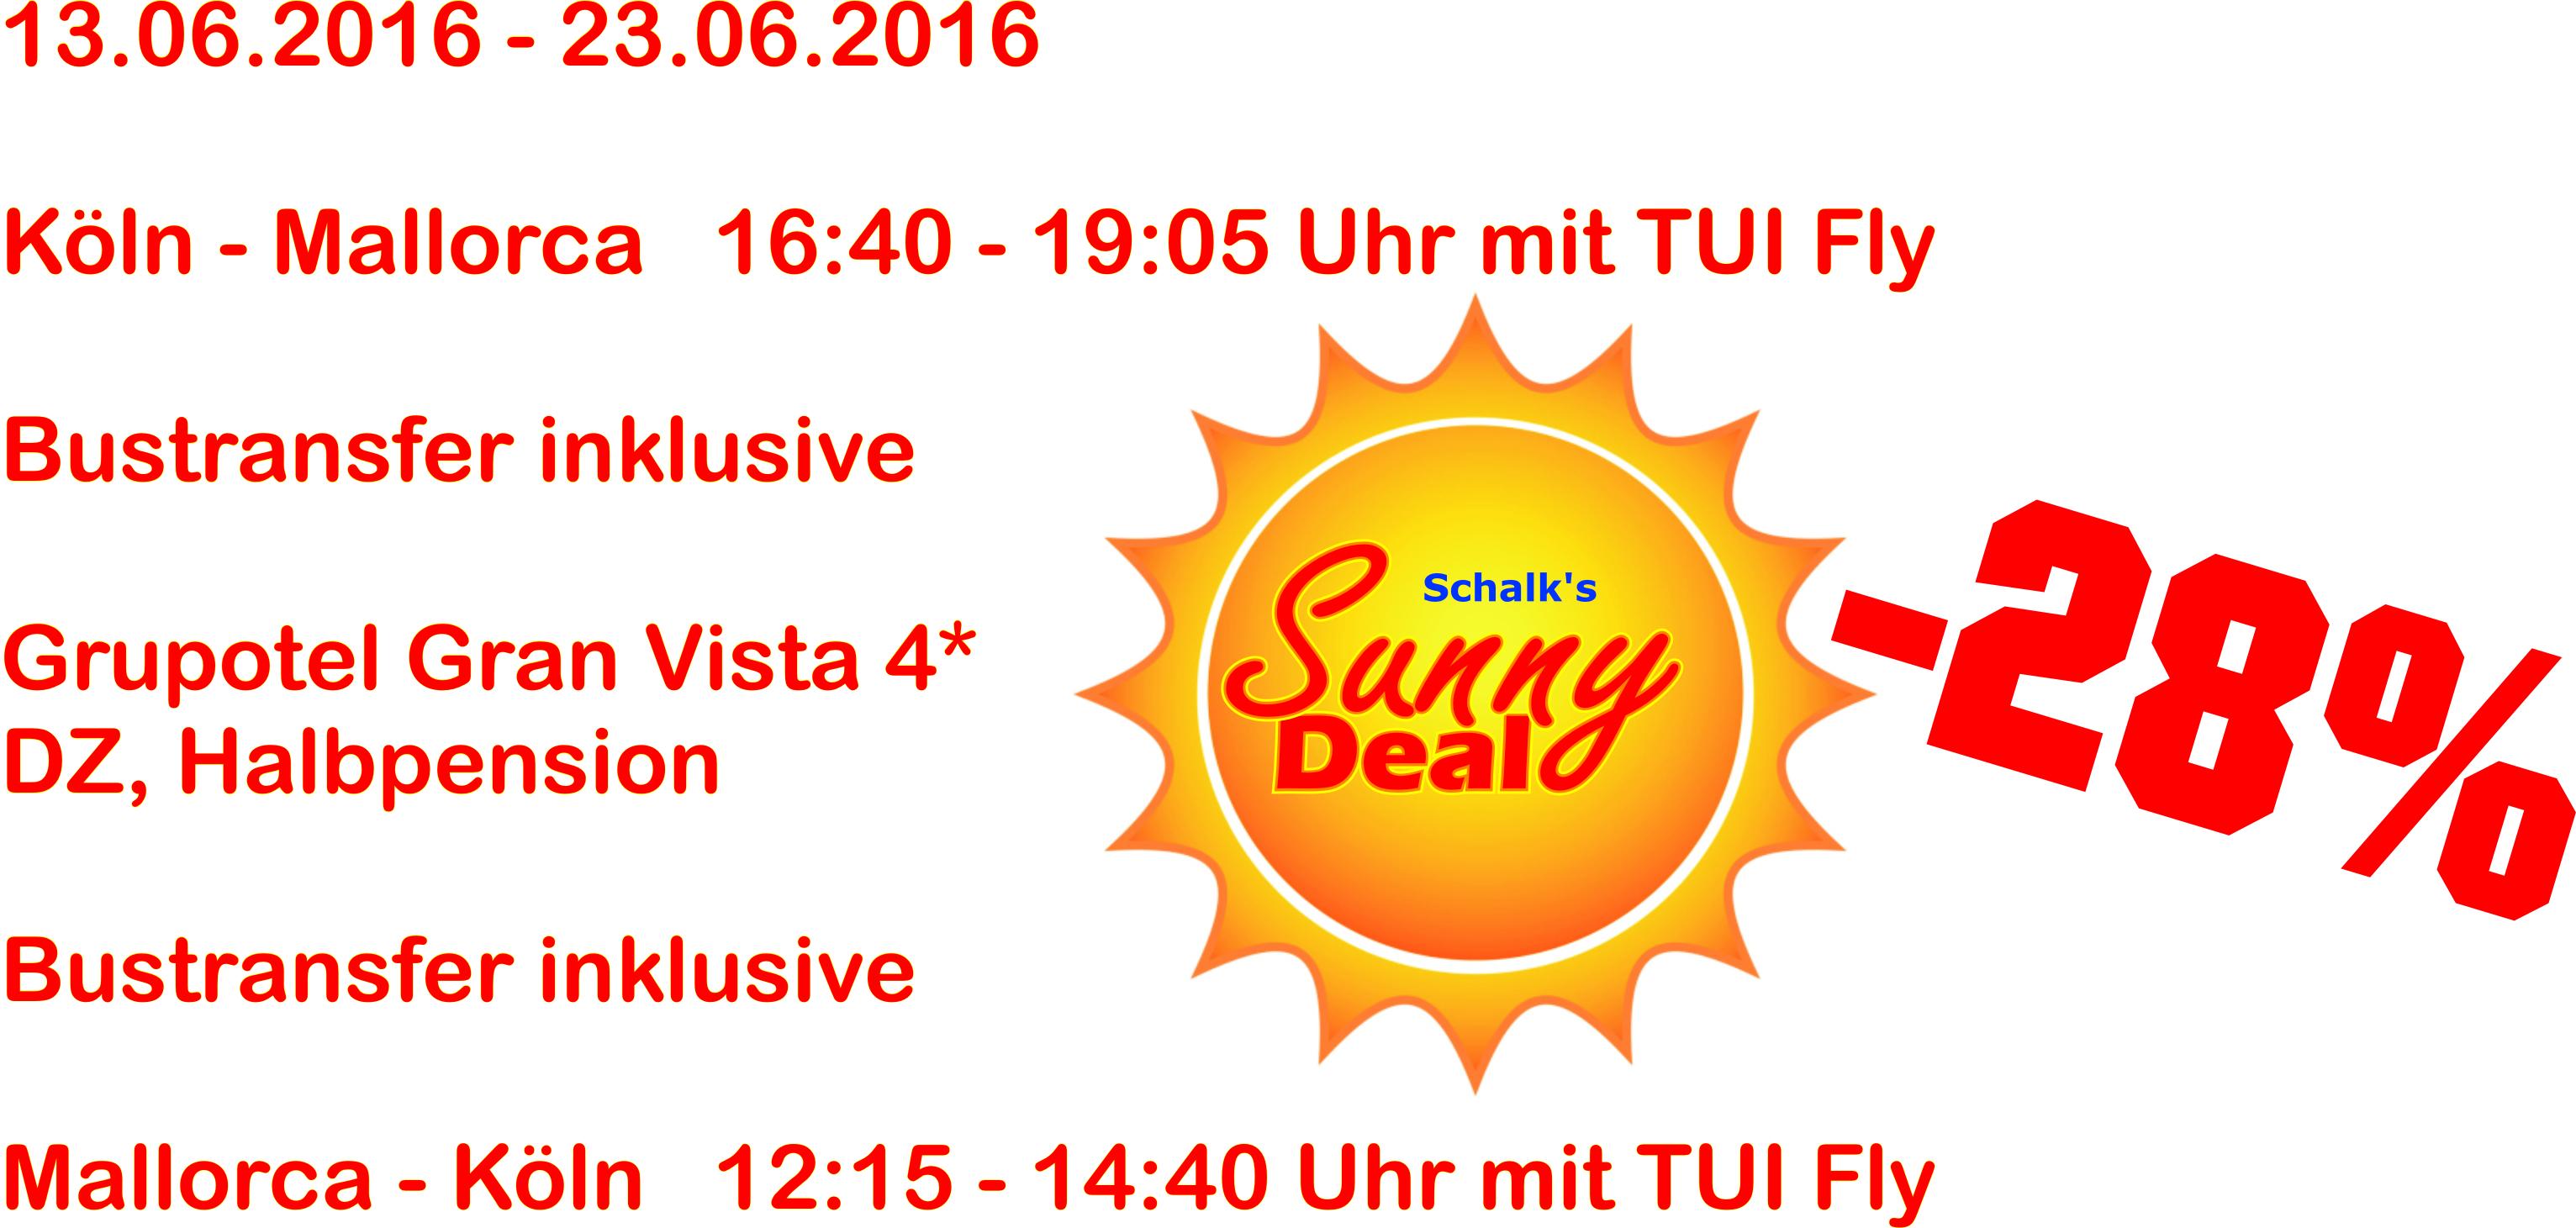 Sunny Deal Angebot aktuell mallorca